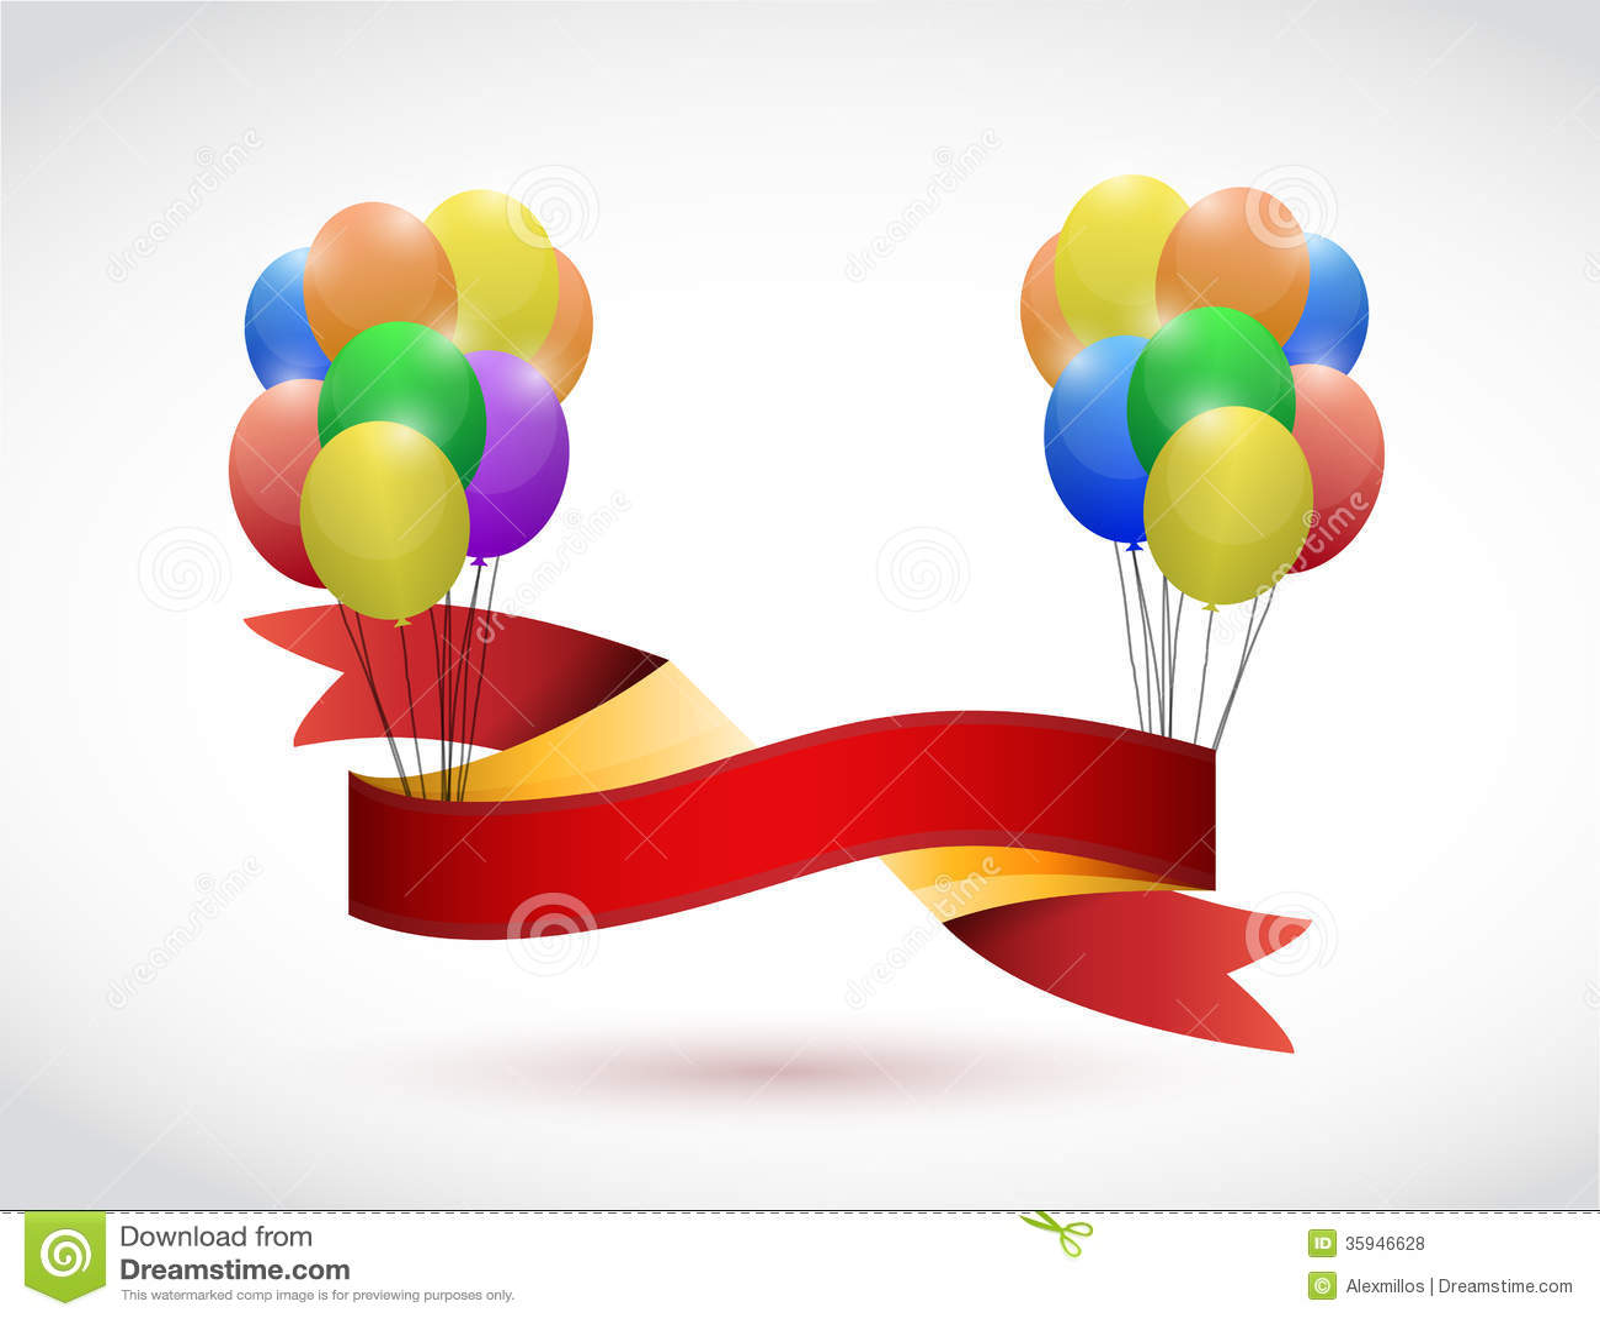 Black ribbon and balloons illustration design over a white background.